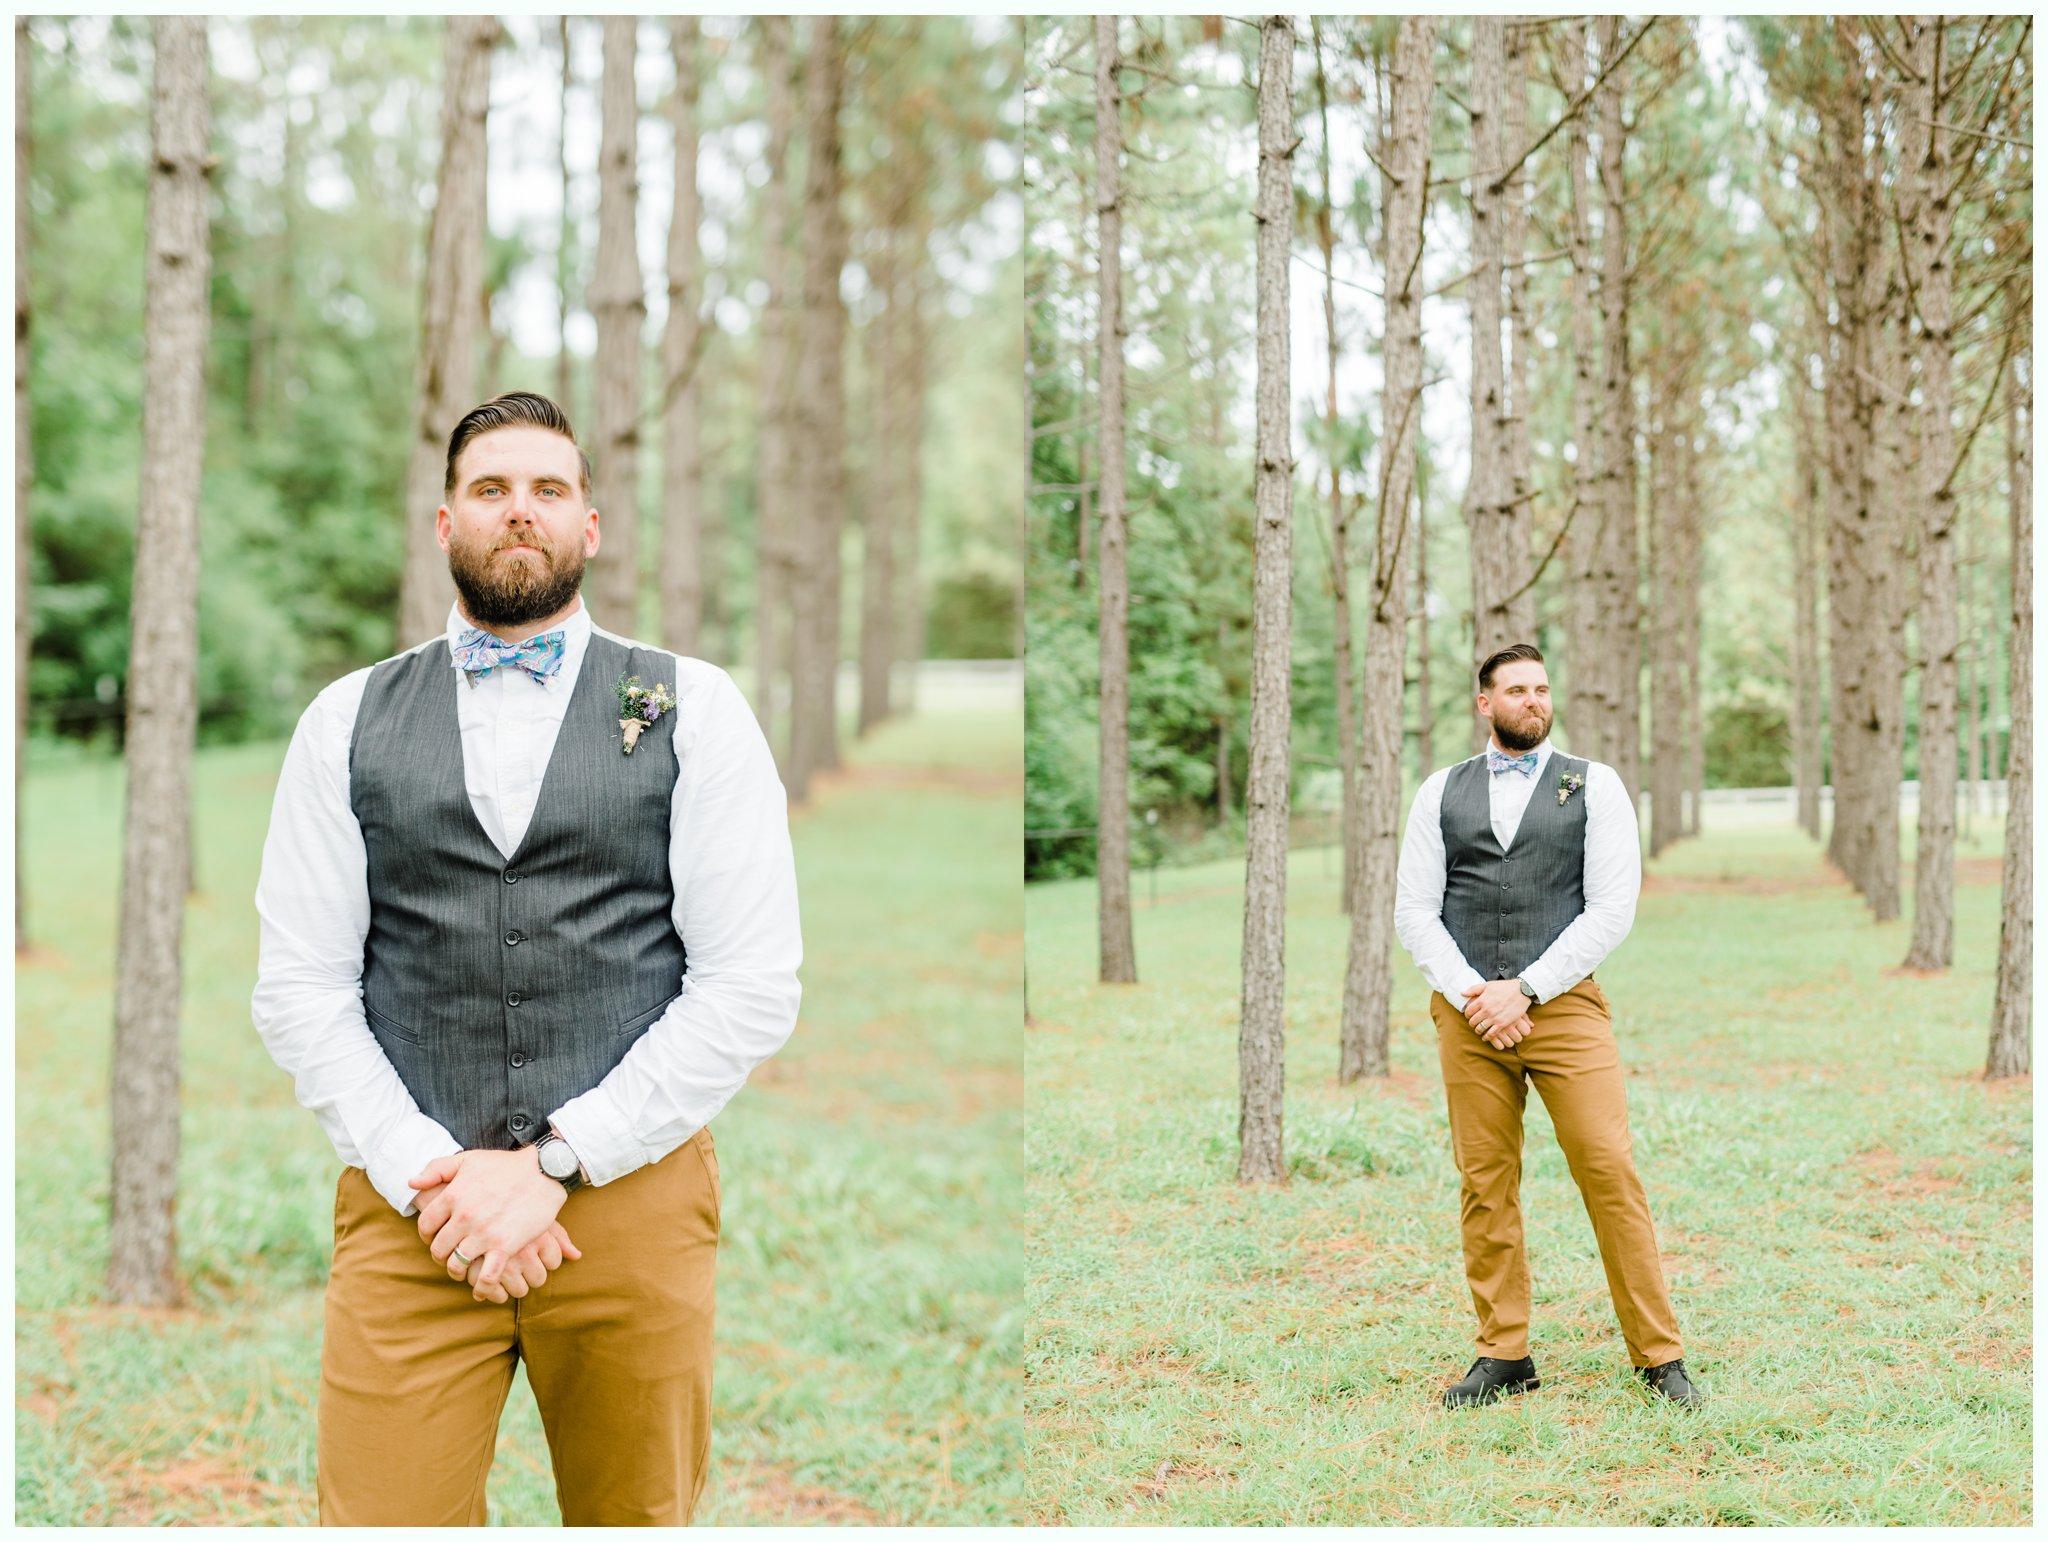 Jake&rhondawedding_5231.jpg